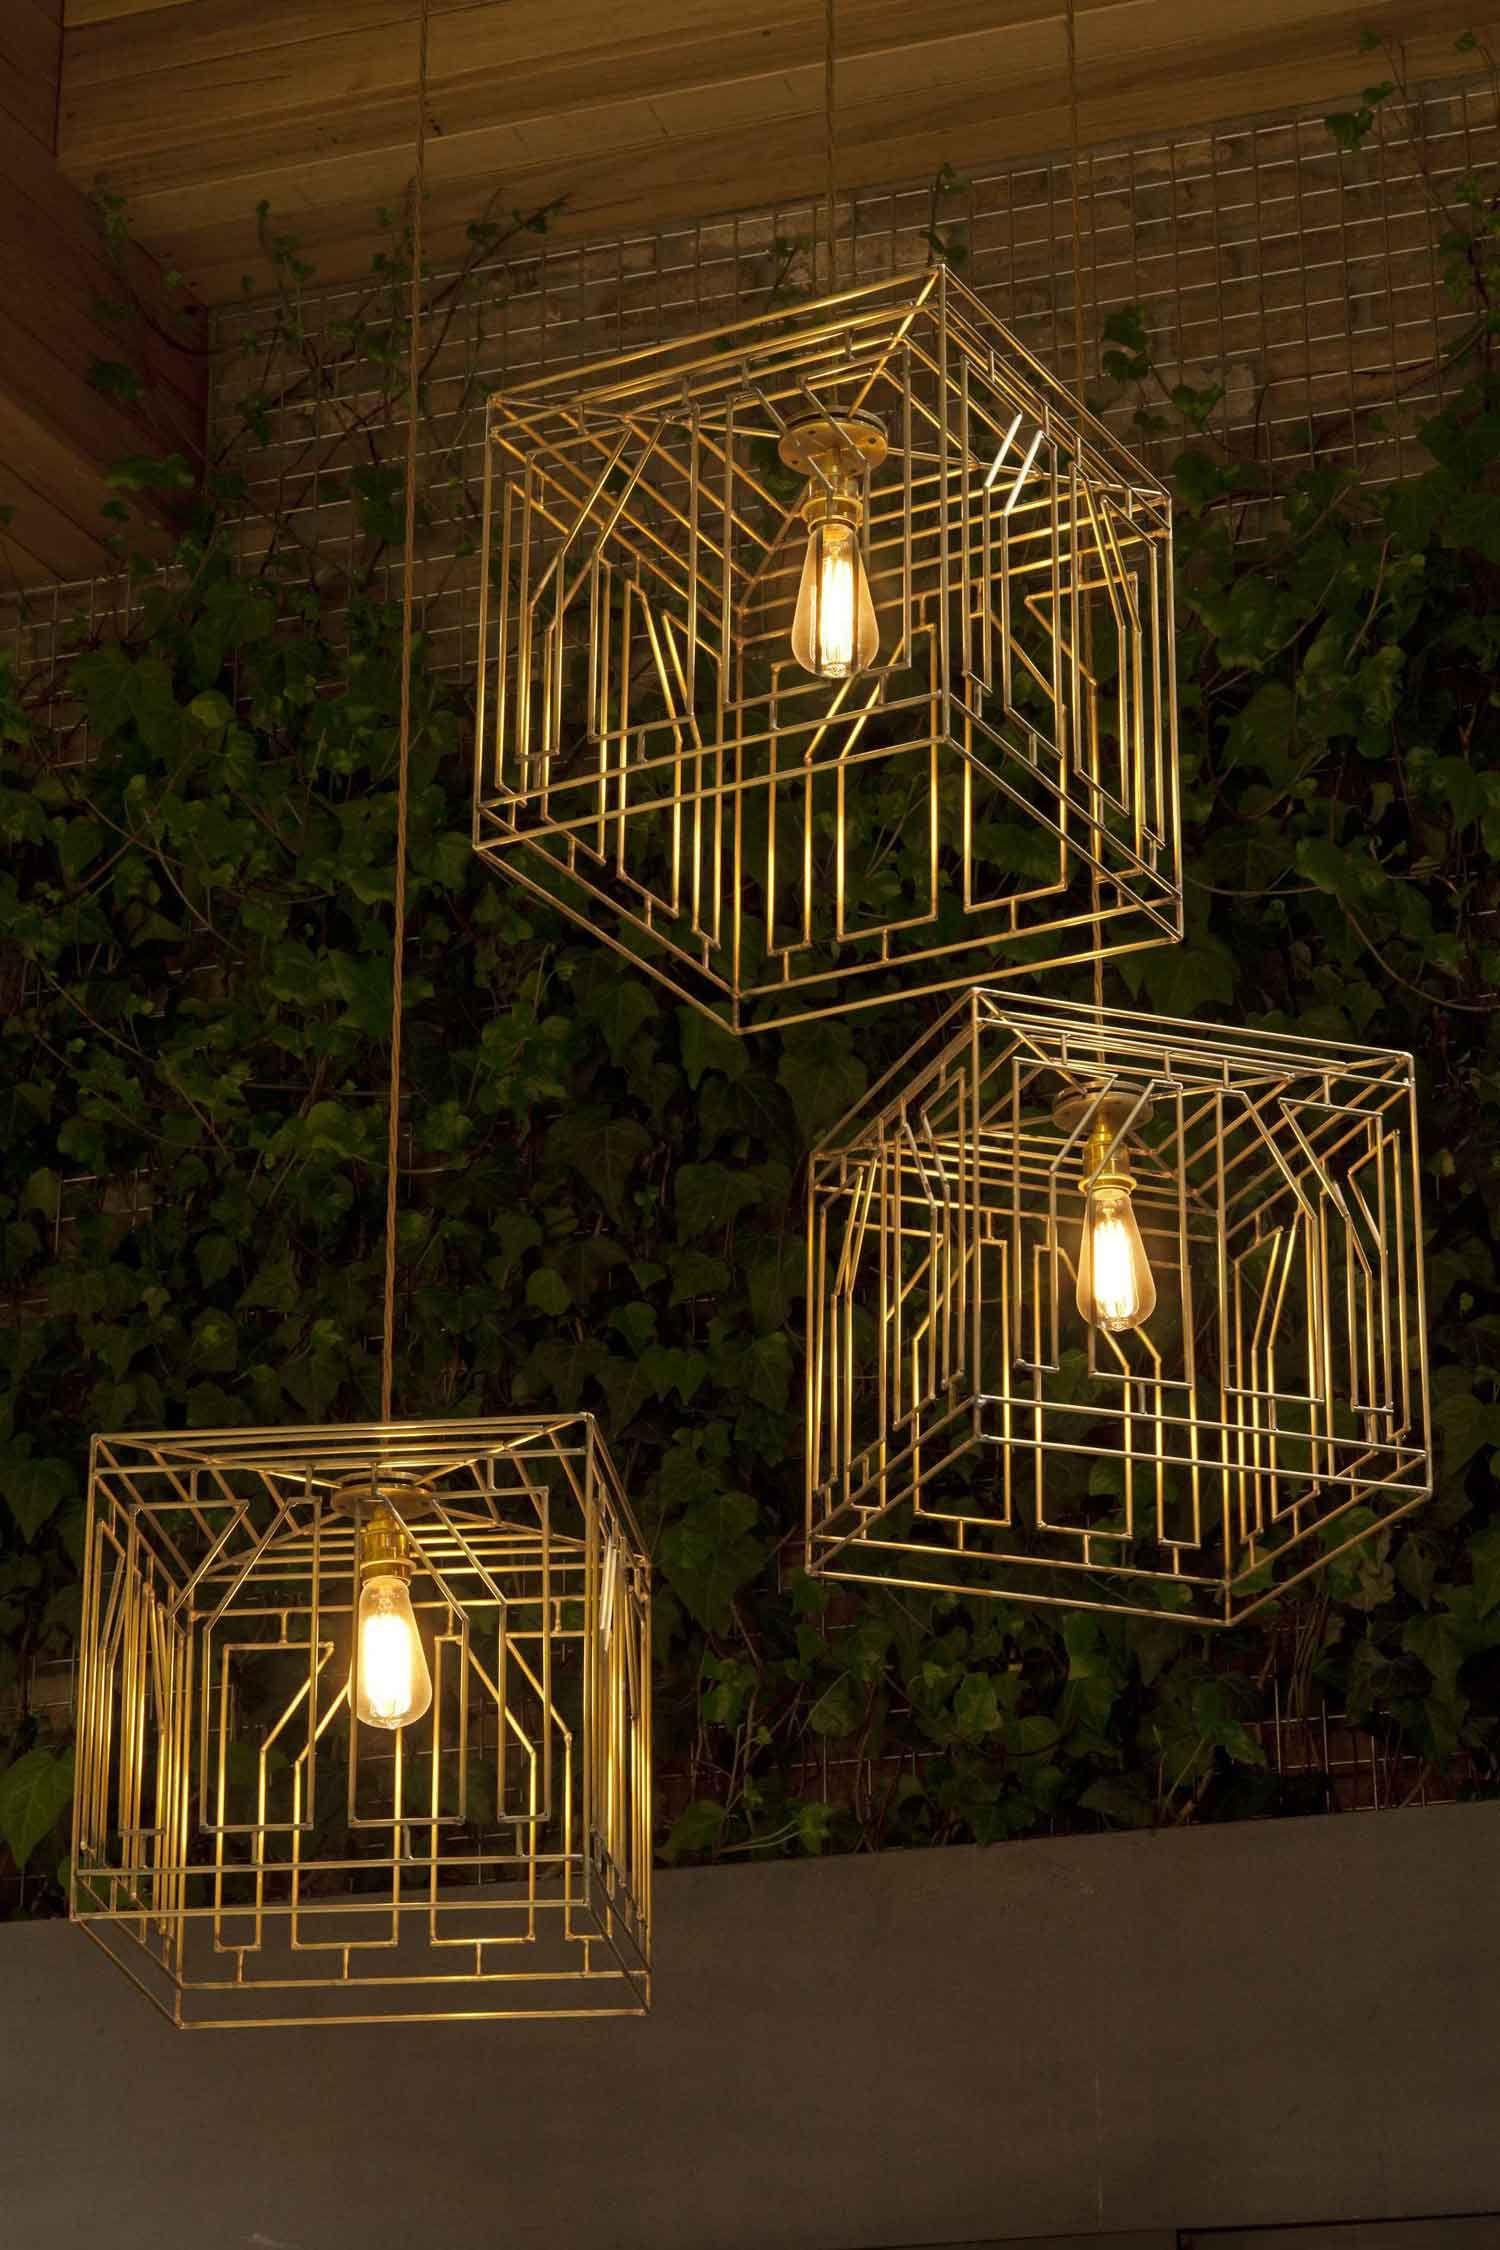 #licht #lichter #lights #light #bright #hell #lampe #lampen #lamp #lamps #design #interior #einrichtung